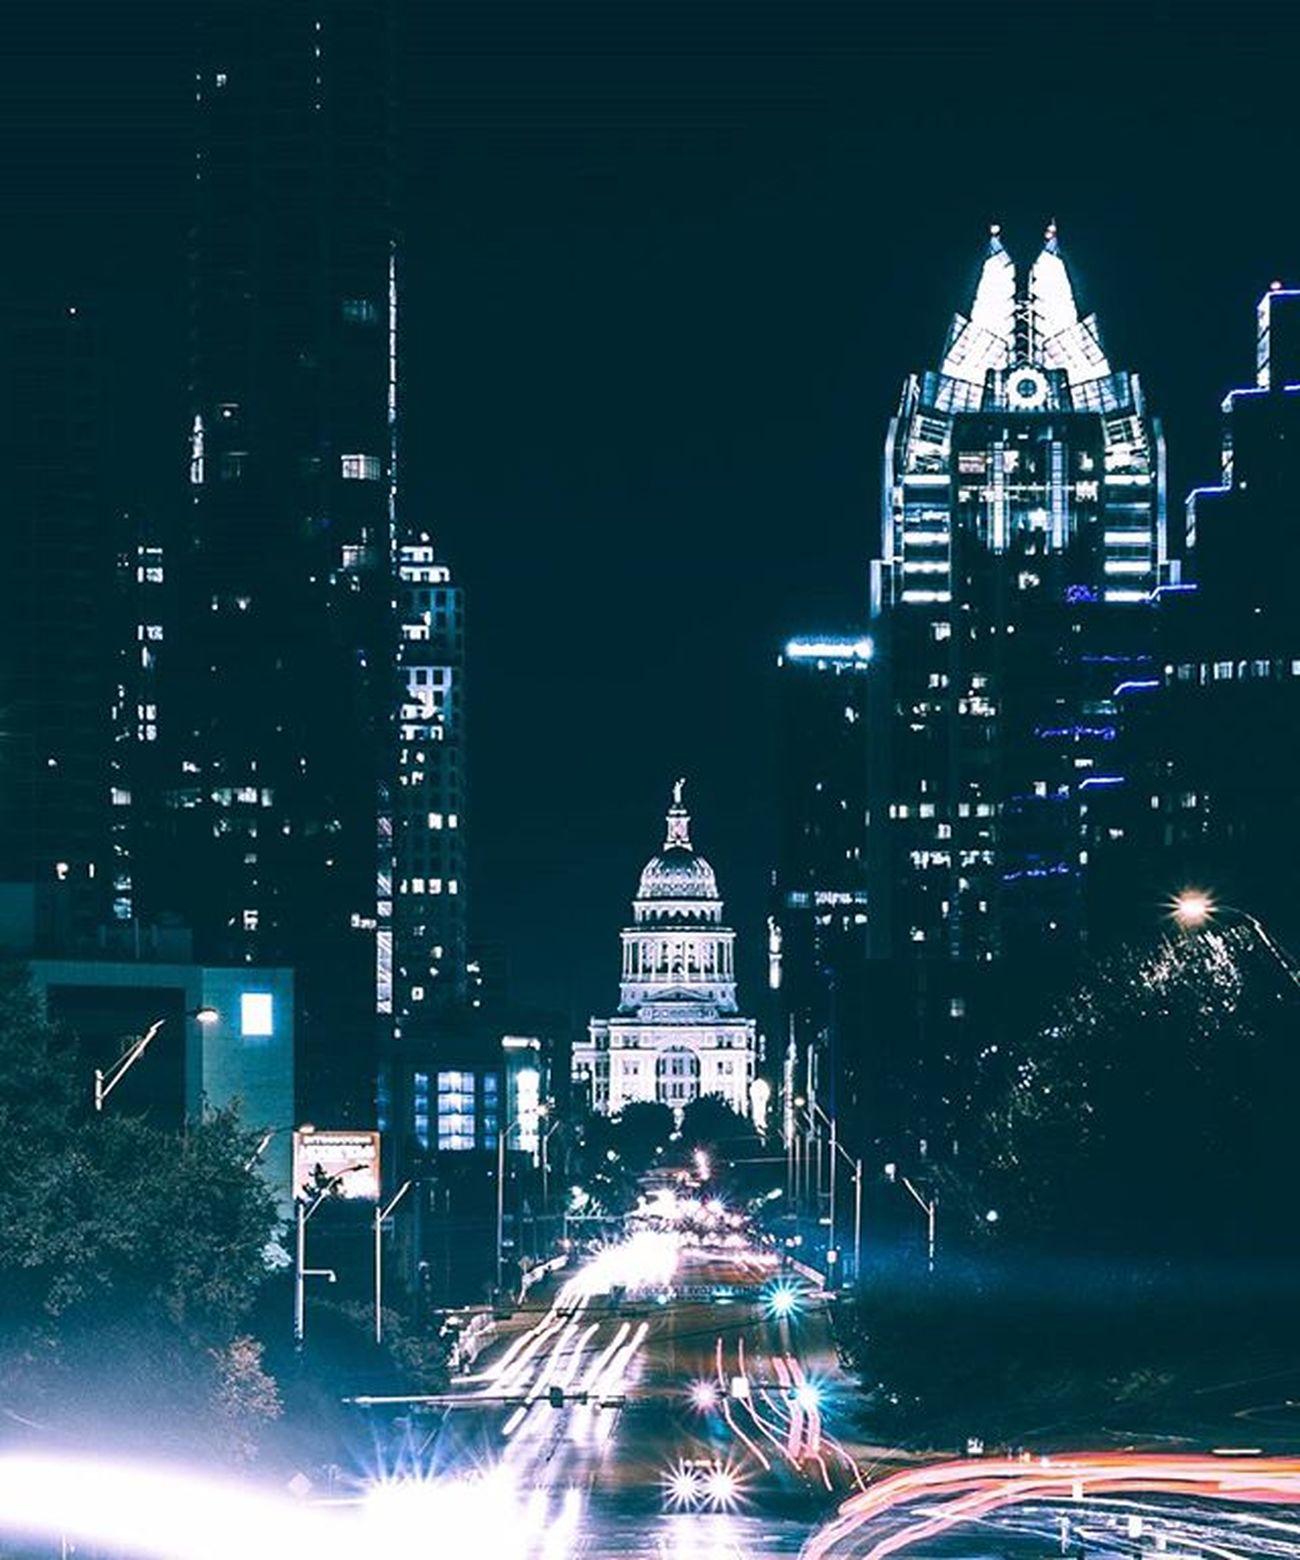 ❇❇❇ Austin Texas Texas Swsw Streetphotography Longexposure Longexposurephotography